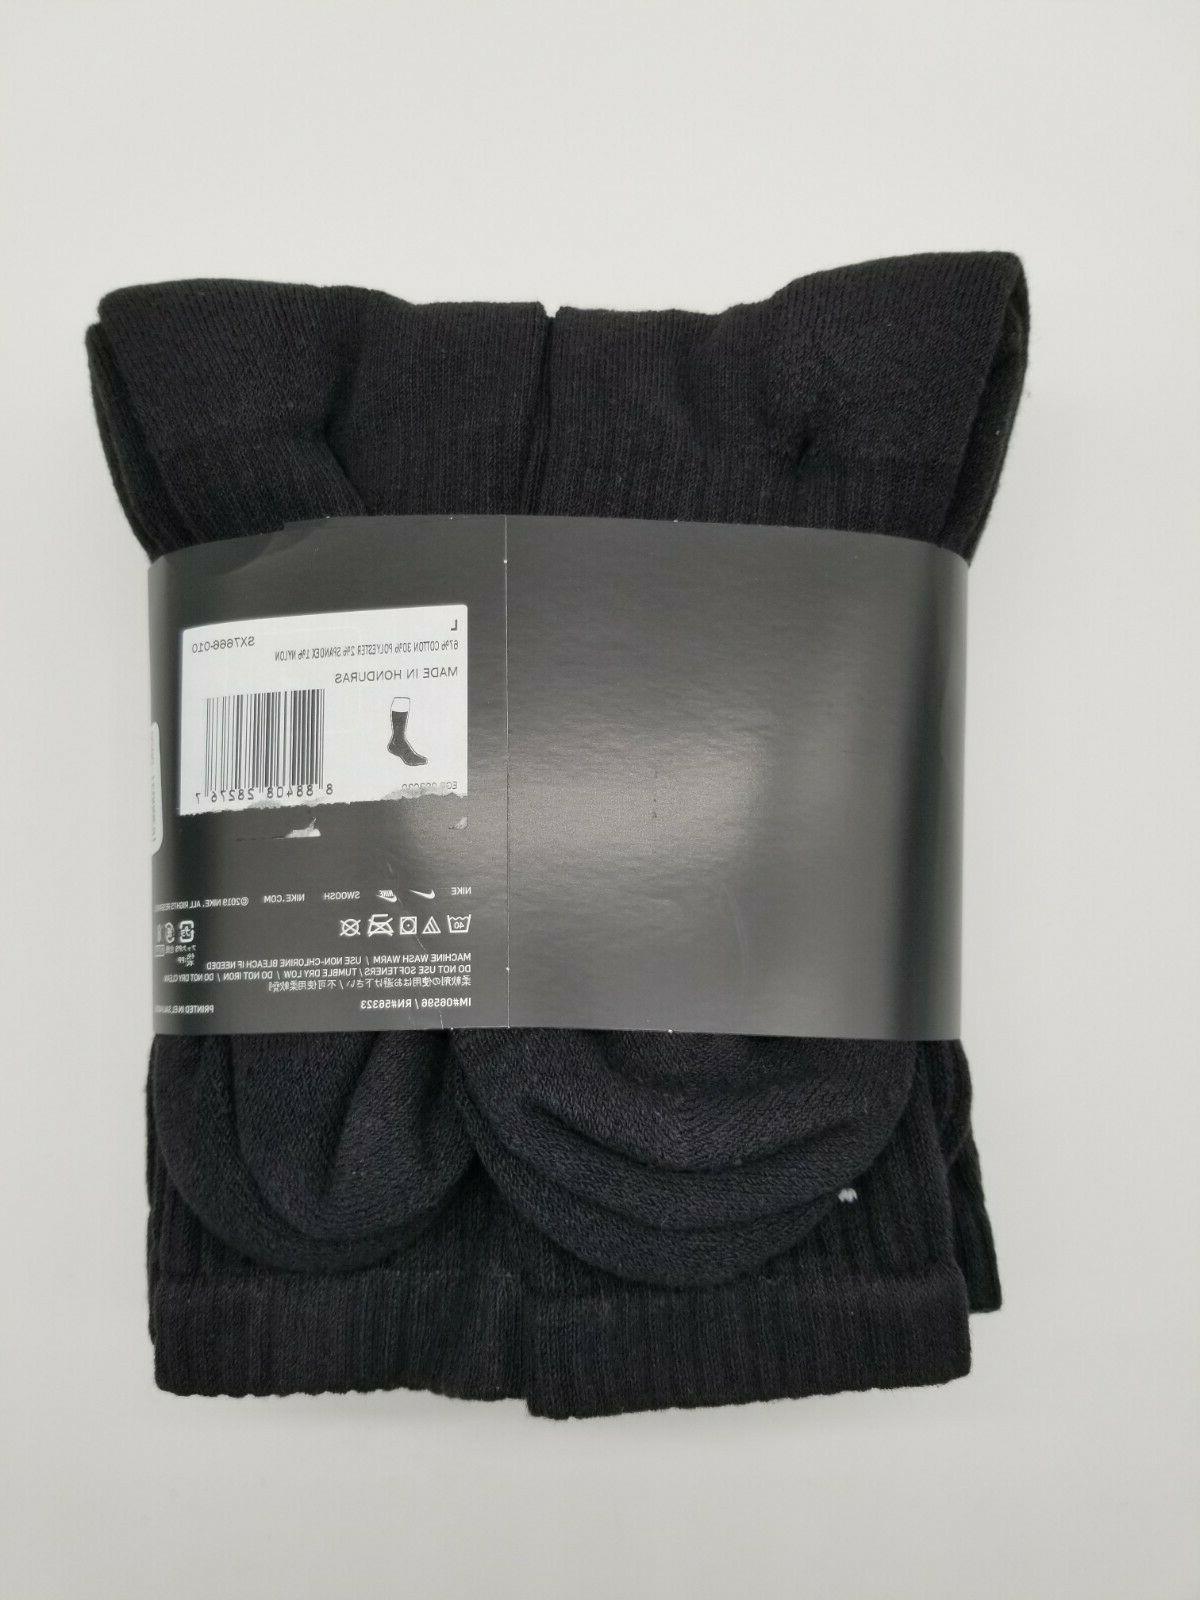 Nike Cotton Cushioned Socks Size L Black